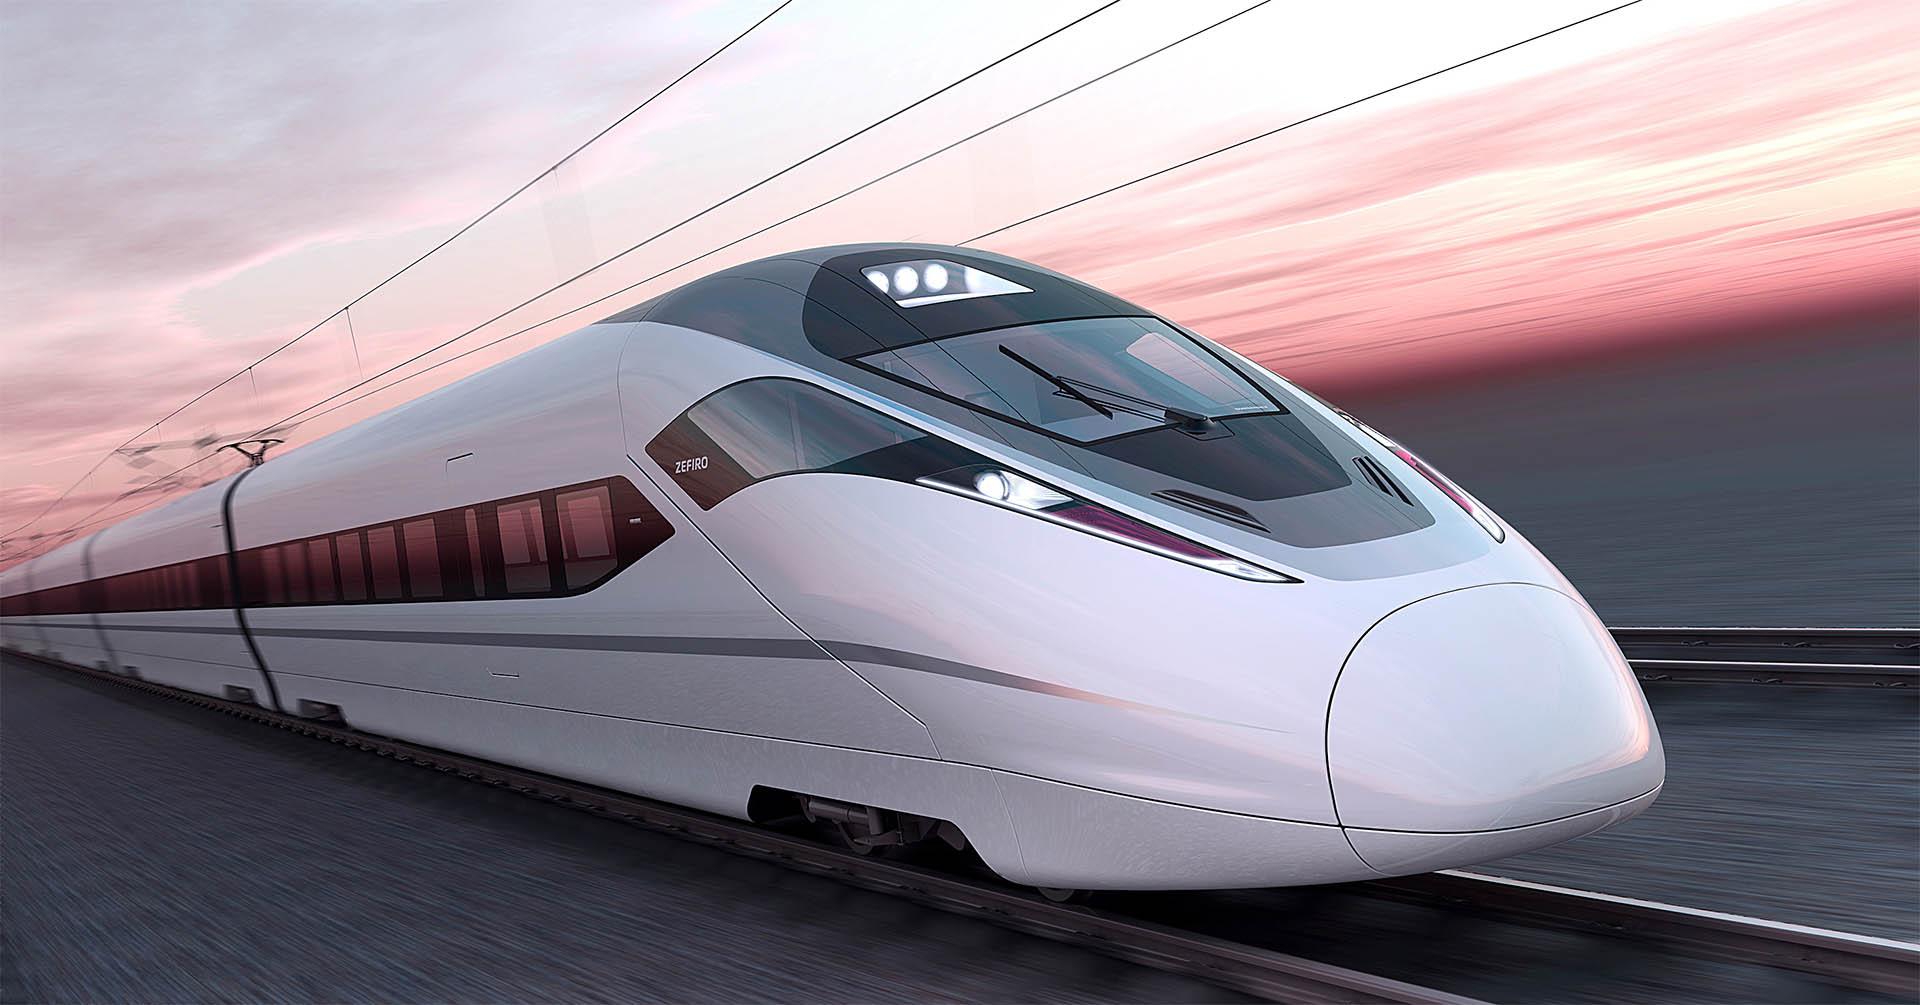 Train transport ferroviairre